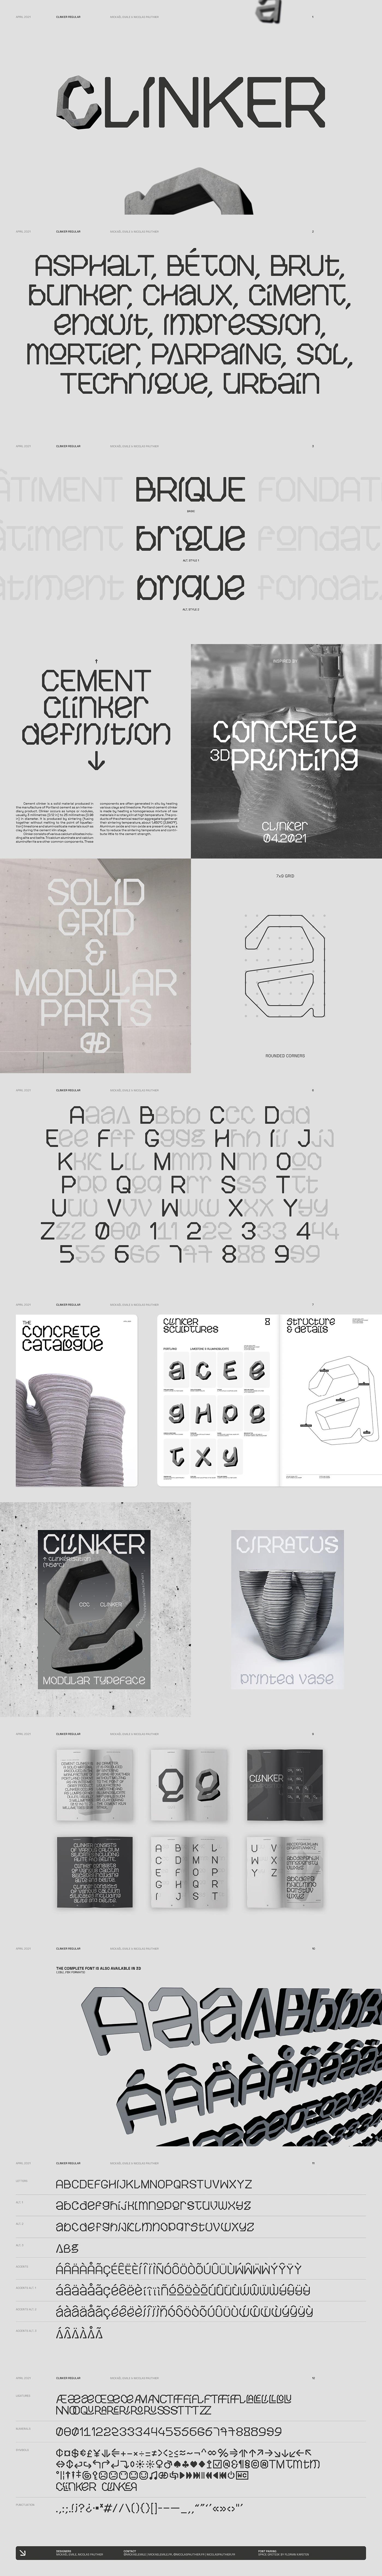 3D 3D Font 3d printing concrete Display font sculpture Typeface typography   geometric